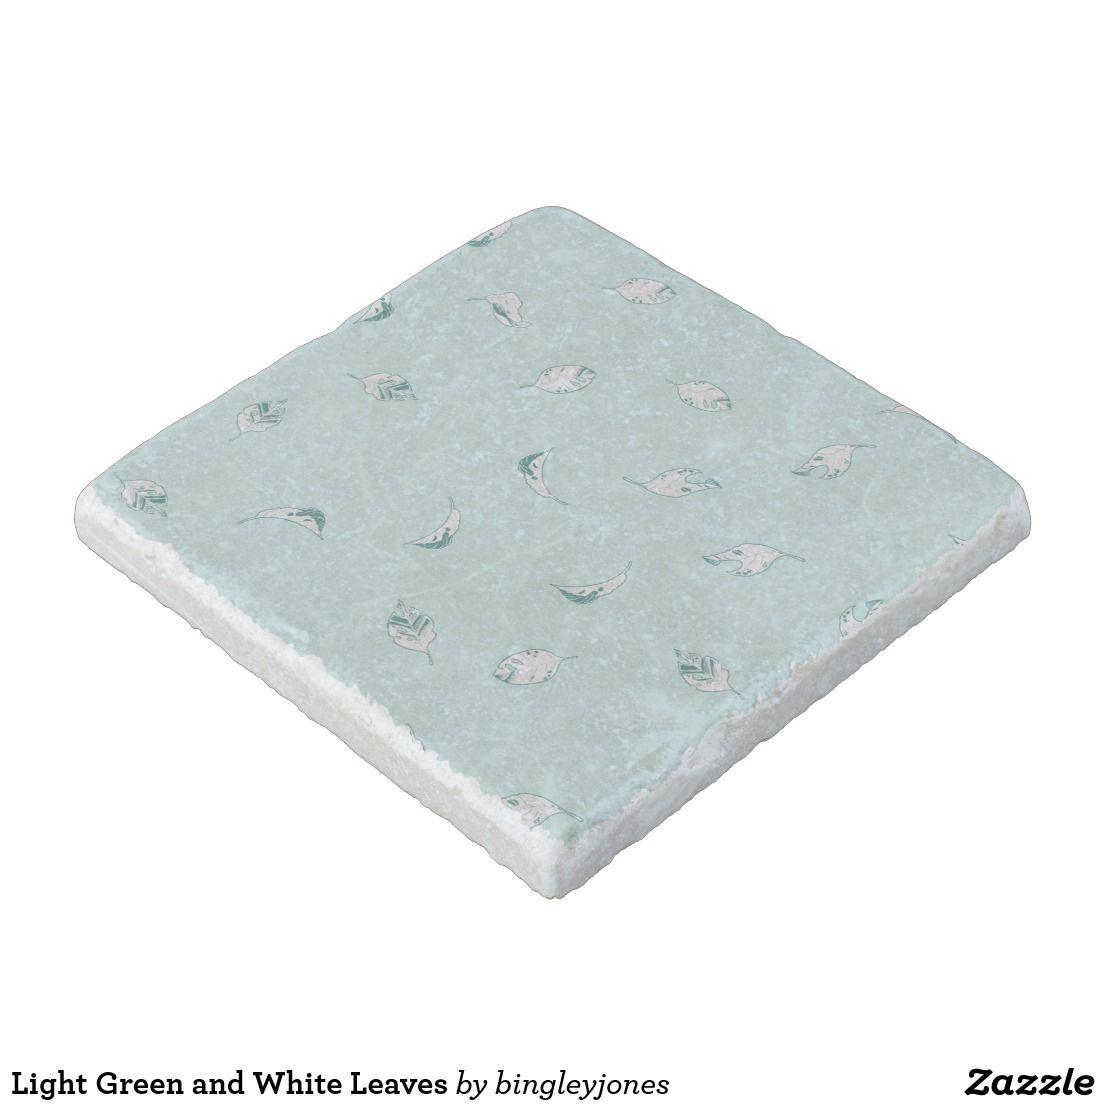 Light Green and White Leaves Stone Coaster   Zazzle.com ...